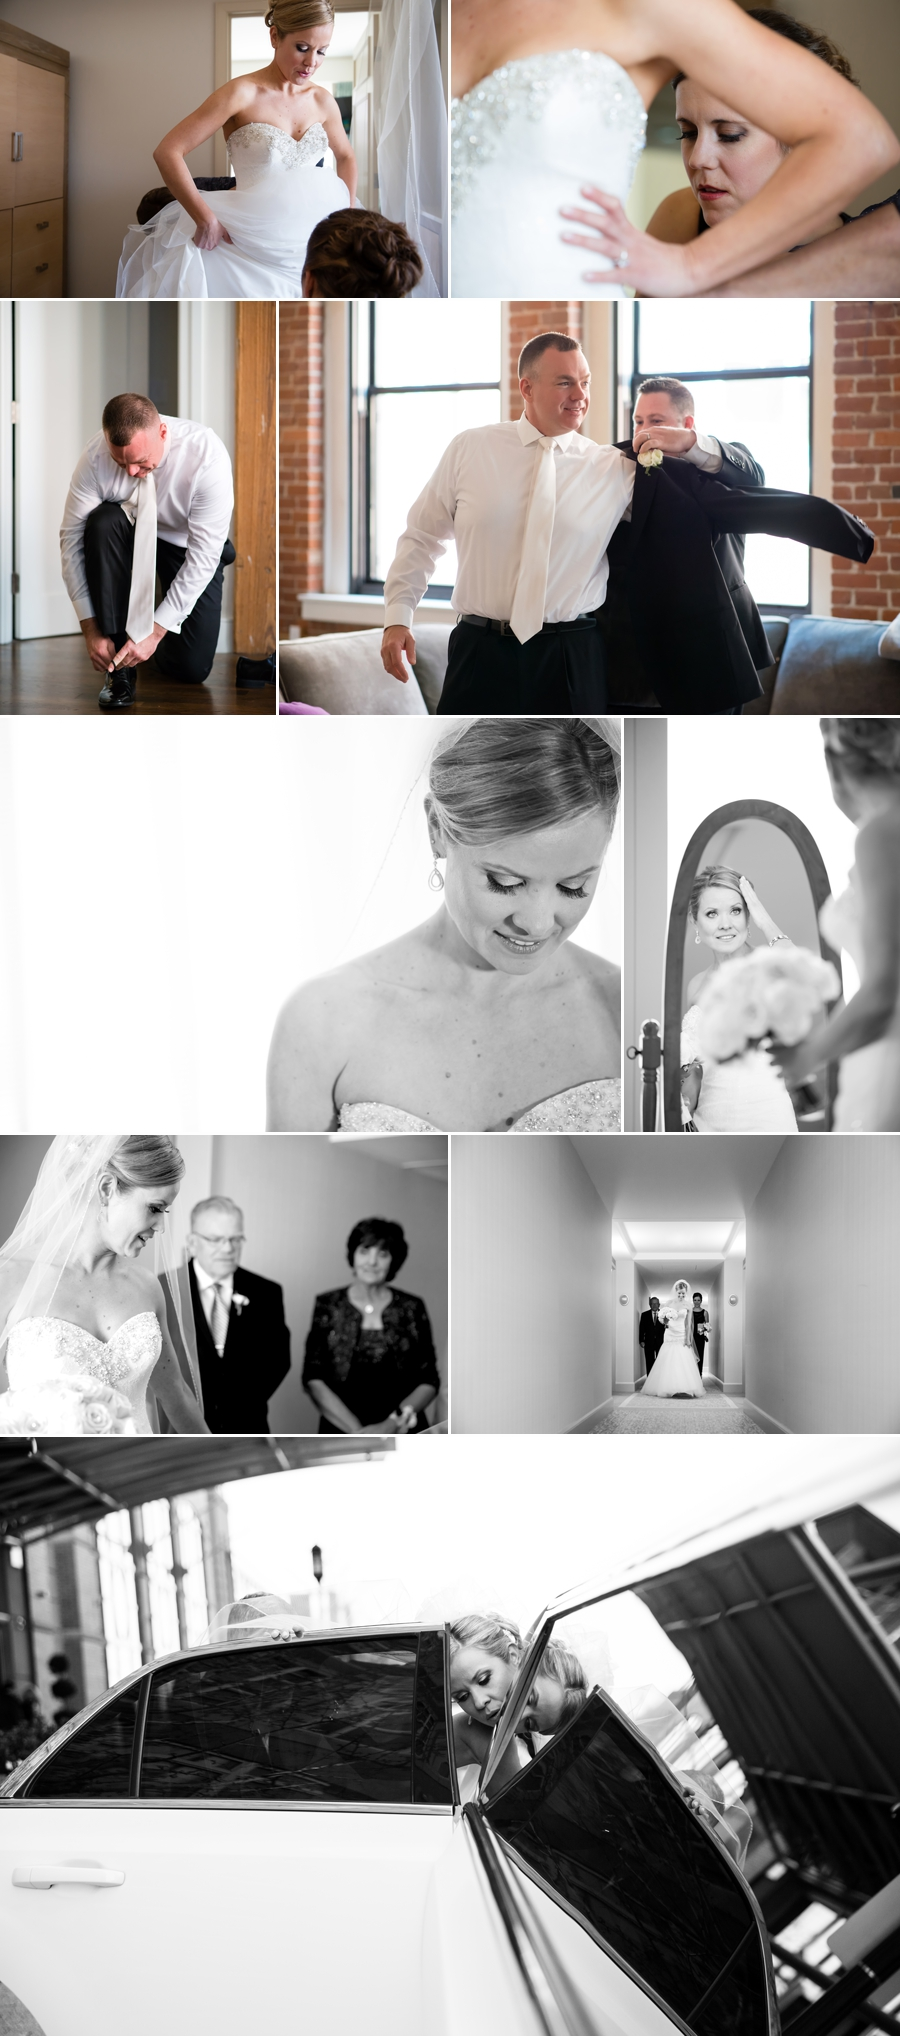 wedding image collage